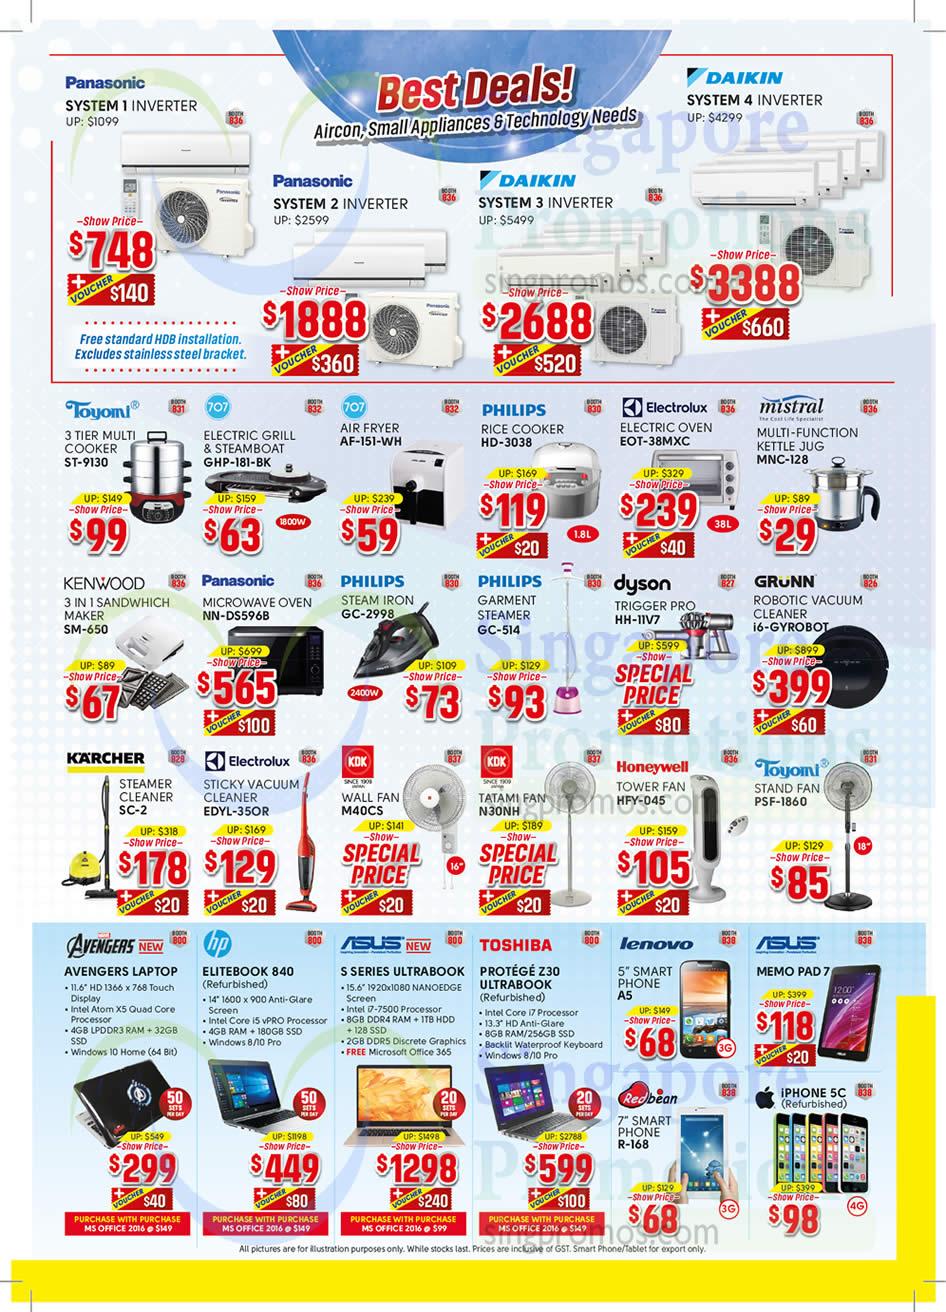 Air Conditioner, Small Appliances, Notebook, ASUS, Toshiba, Lenovo, Panasonic, Daikin